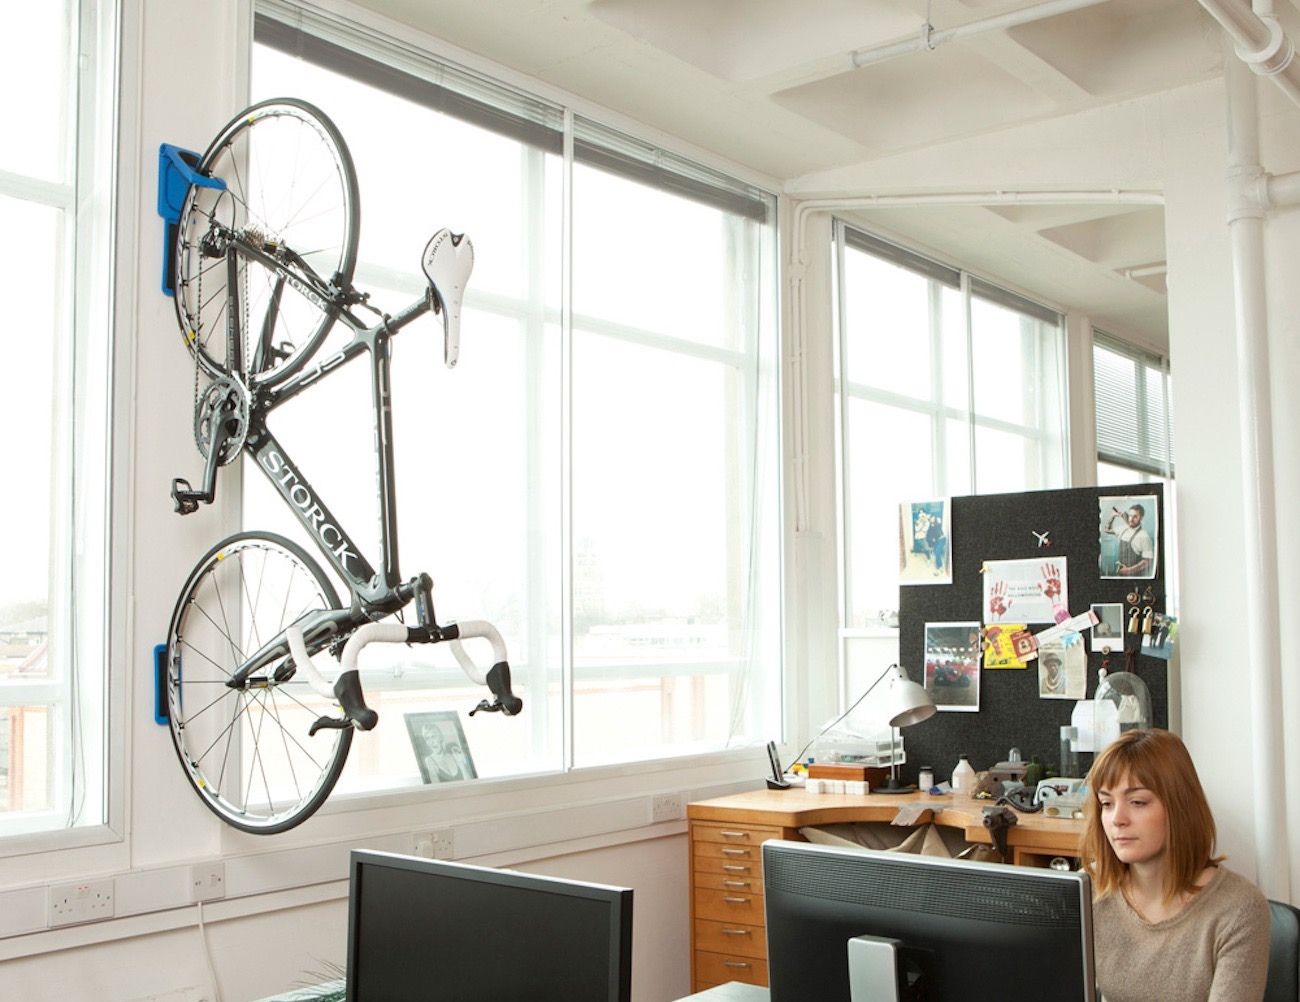 Endo Fold Flat Vertical Bike Storage System by Cycloc